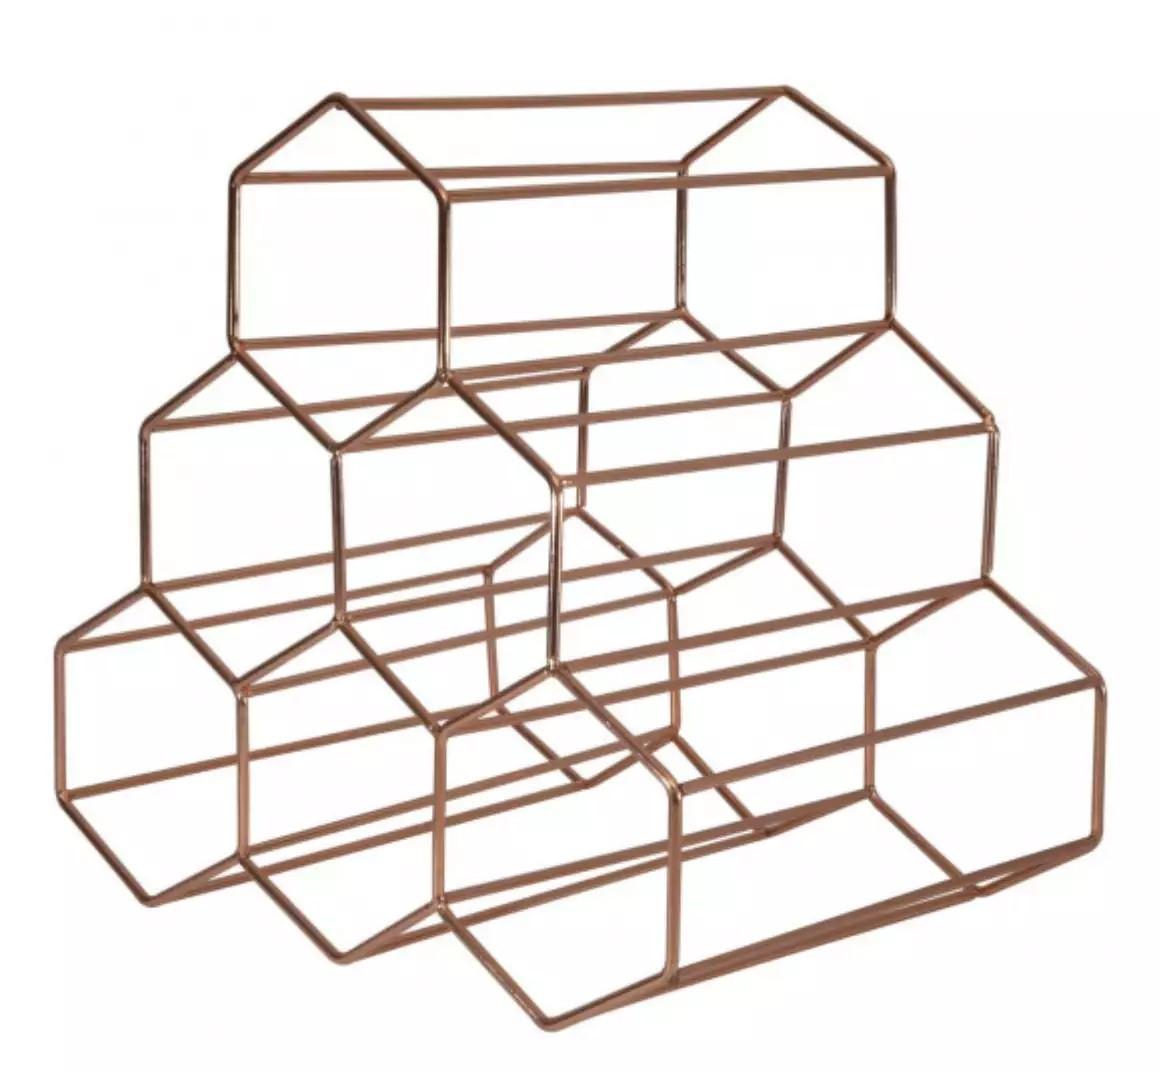 Suporte p/ Garrafas de Vinho Geometrics 6 Garrafas 28x22x26,5cm